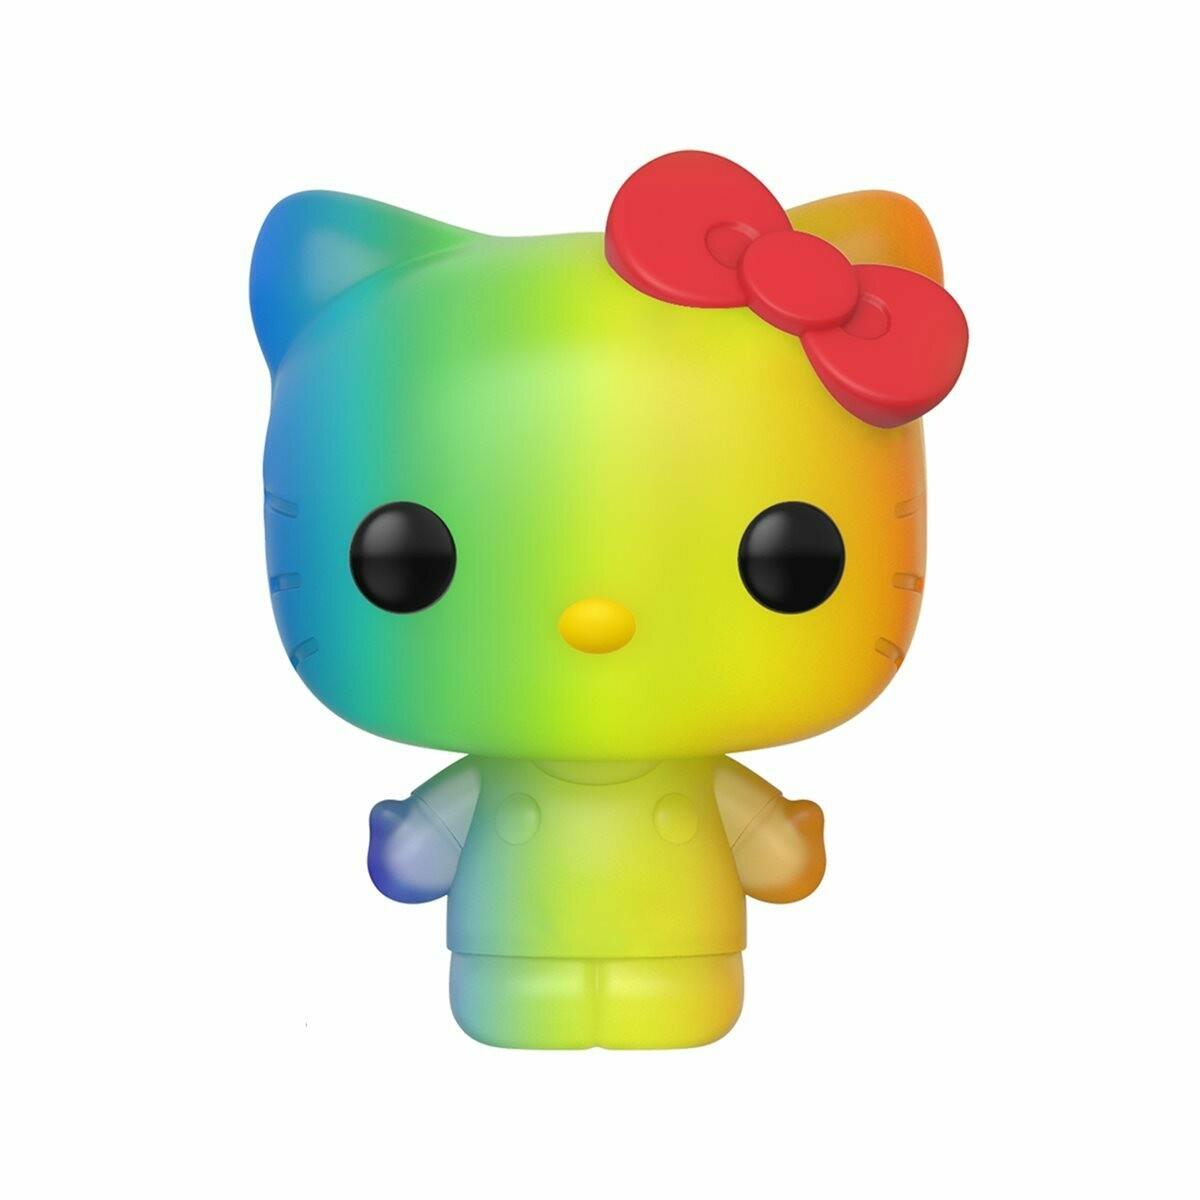 PRE-ORDER Hello Kitty Pride 2020 Rainbow Pop! Vinyl Figure